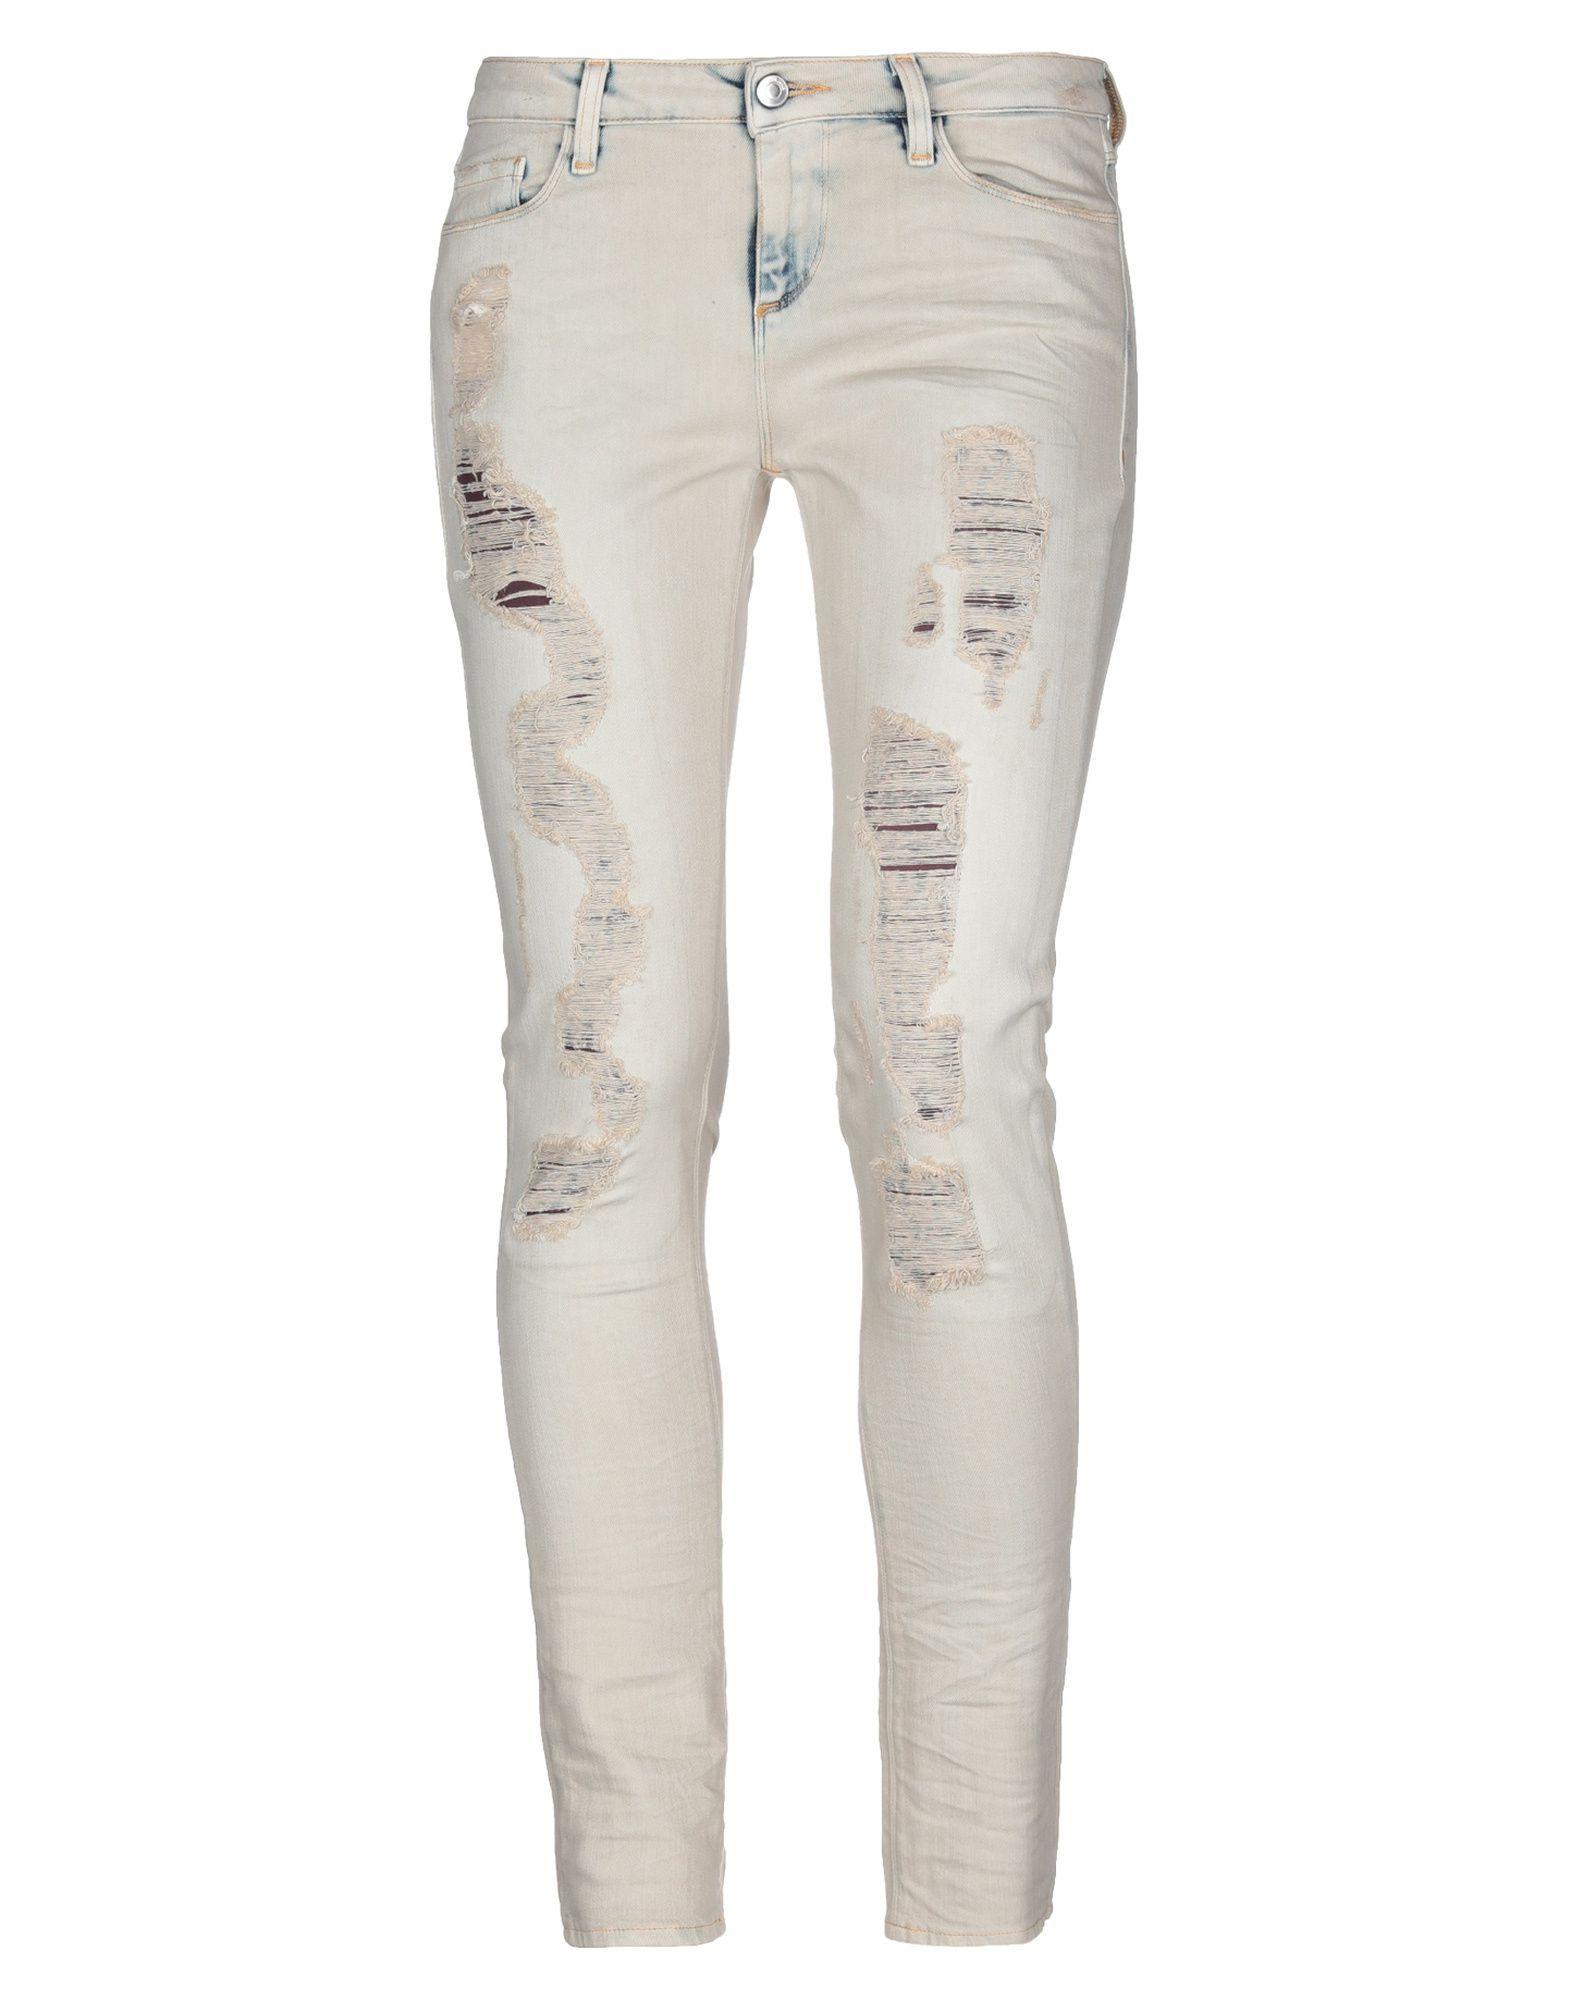 Iro Beige Cotton Distressed Jeans